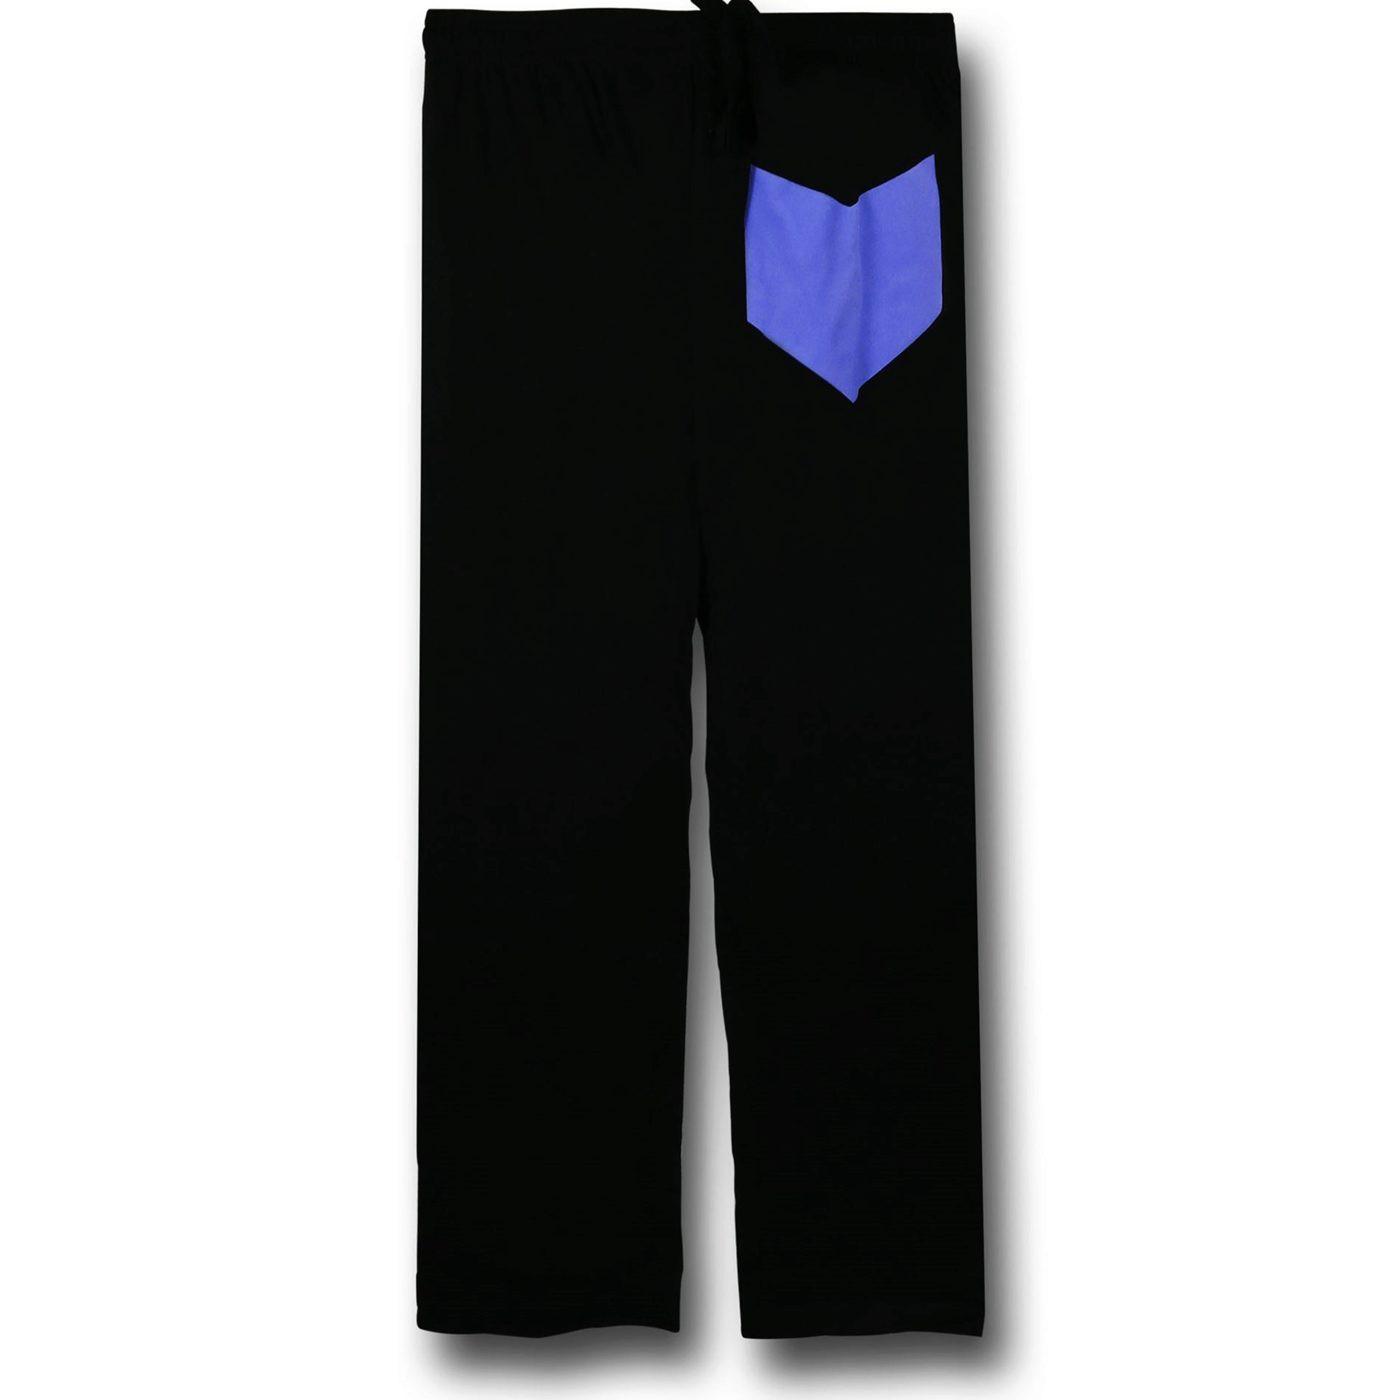 Hawkeye Symbol Sleep Pants